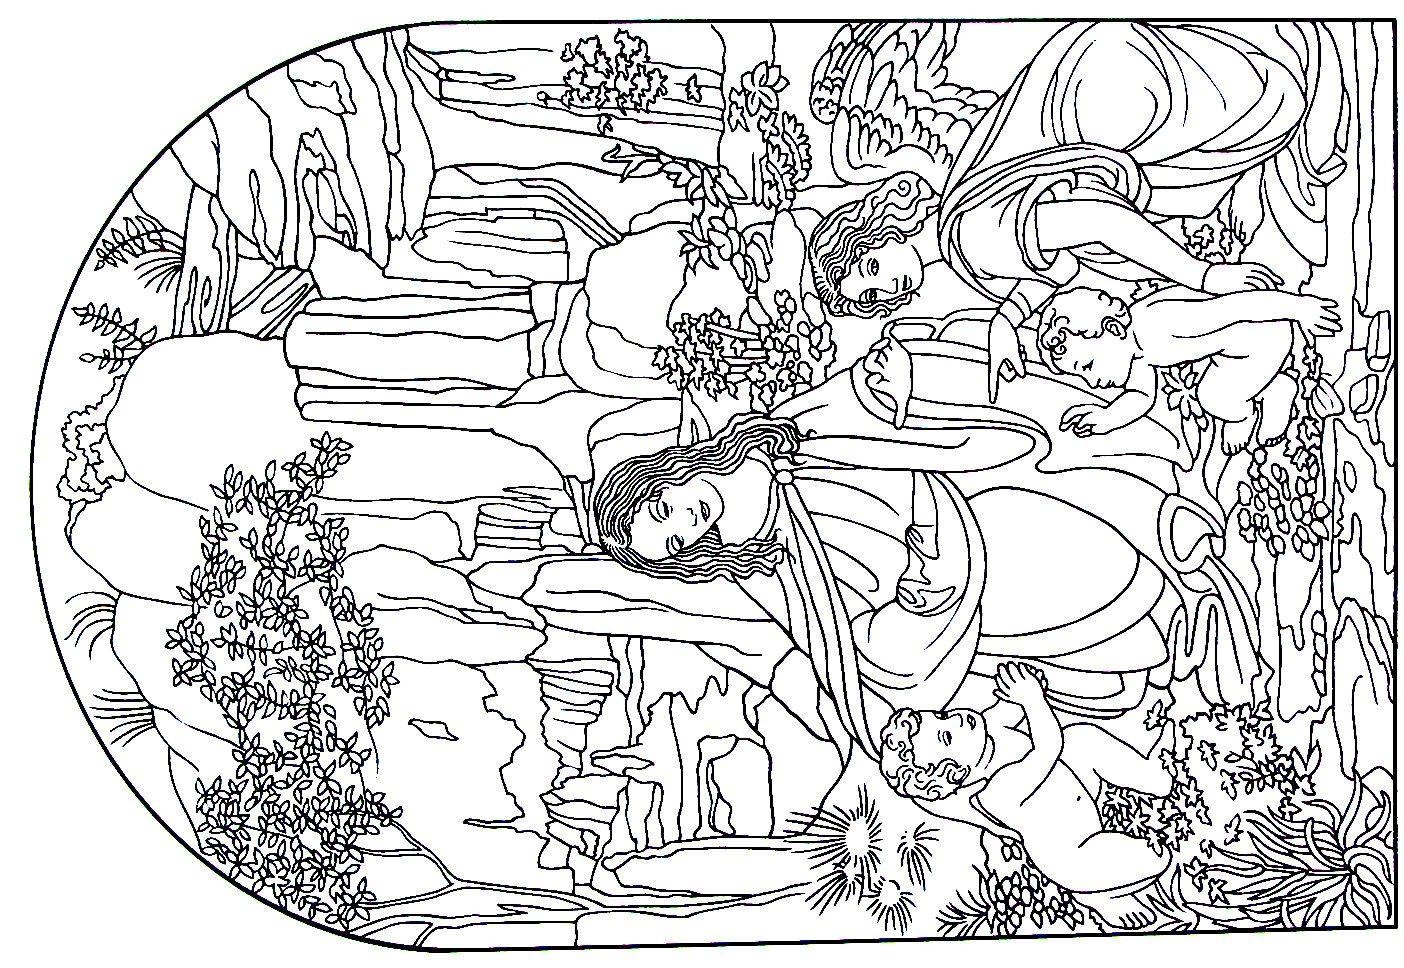 Printable coloring pages renaissance - Virgin Of The Rocks Painting By Leonardo Da Vinci Renaissance Printable Coloring Book Page